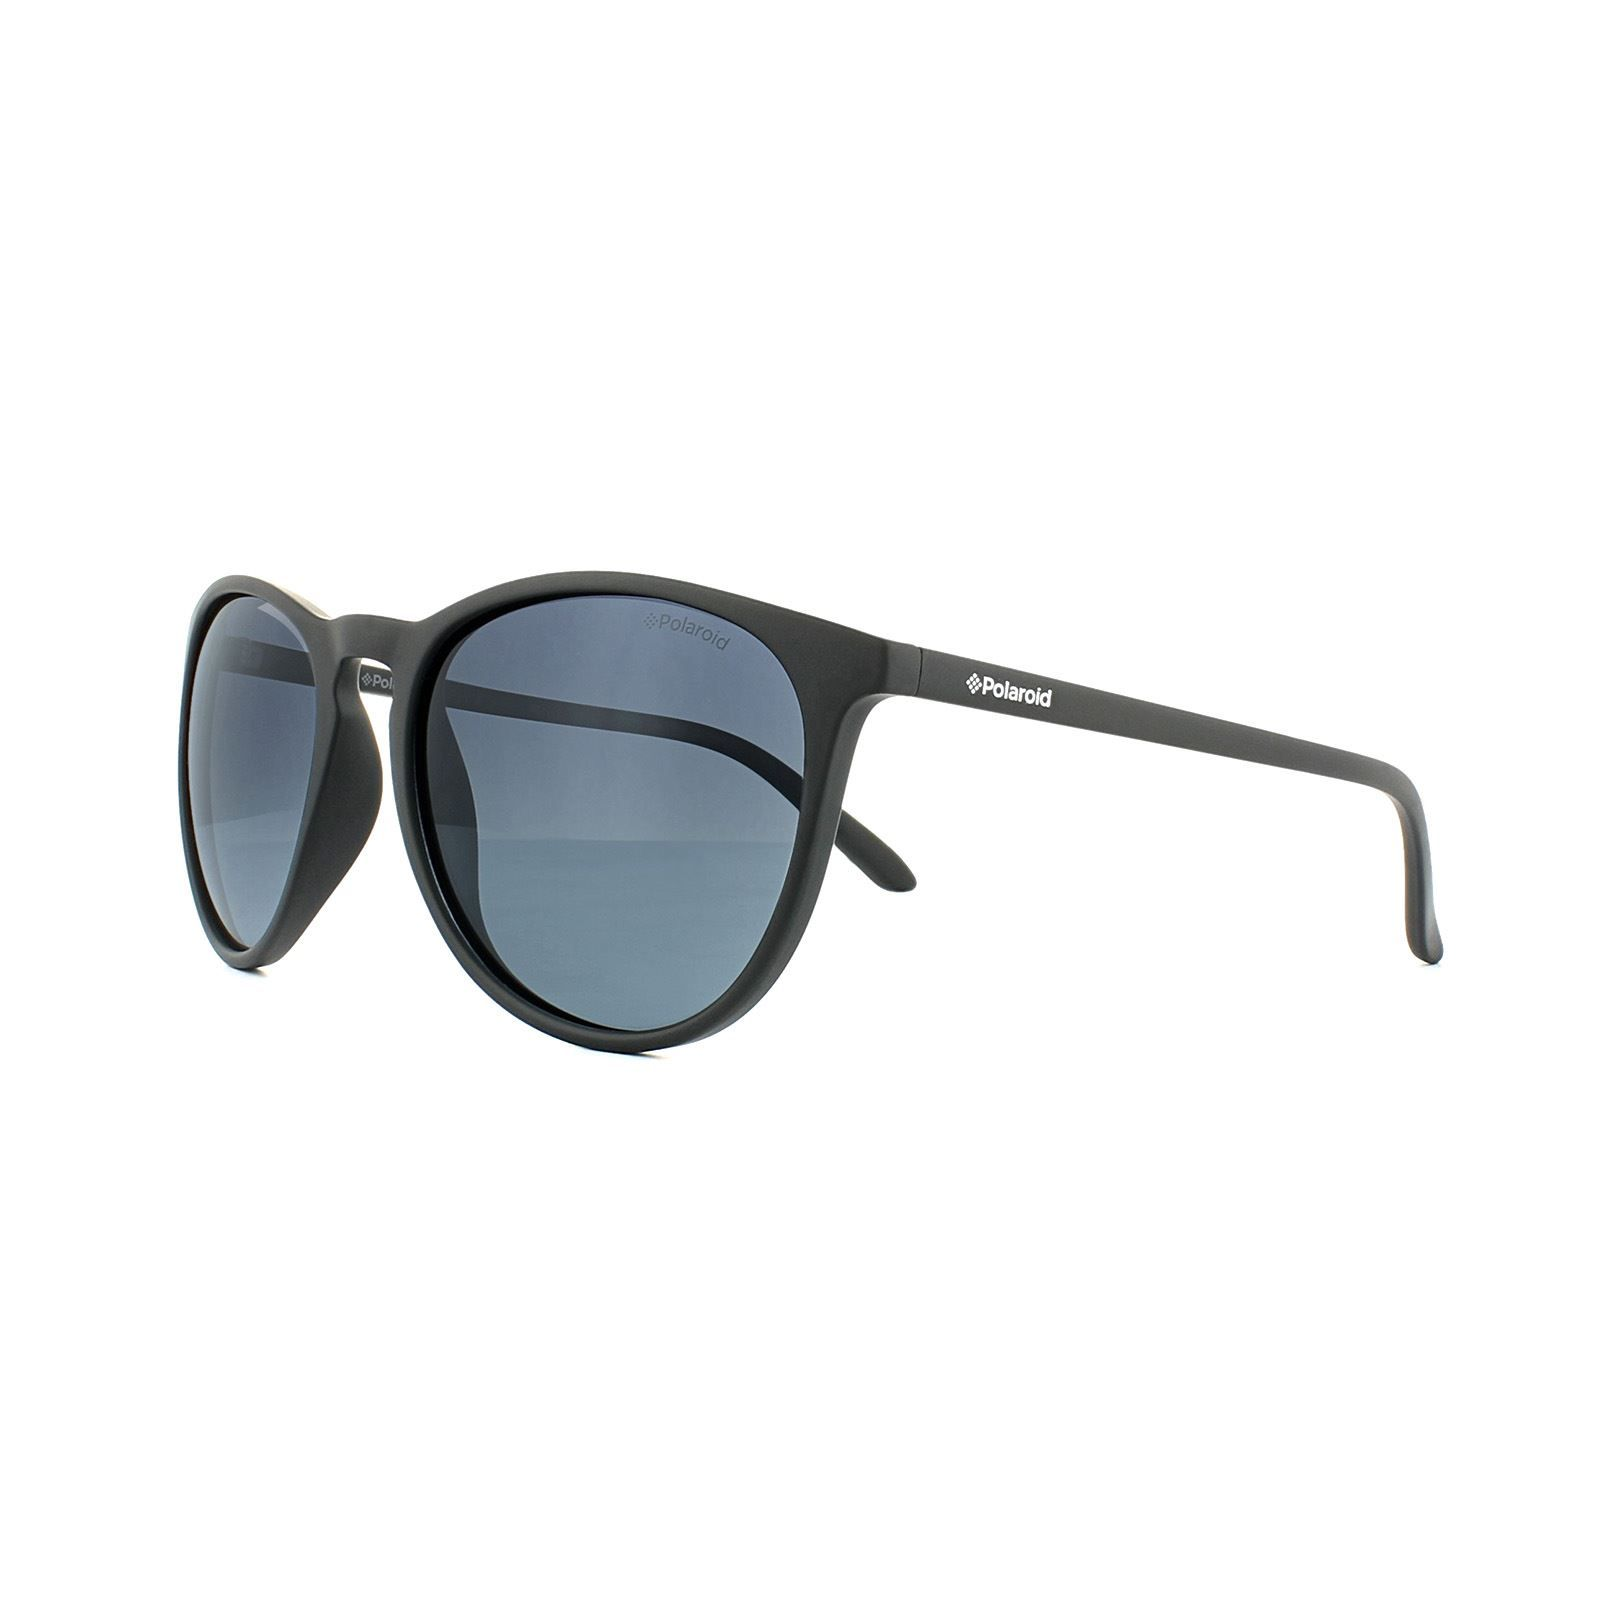 Polaroid Sunglasses PLD 6003/N/S DL5 WJ Matt Black Grey Gradient Polarized